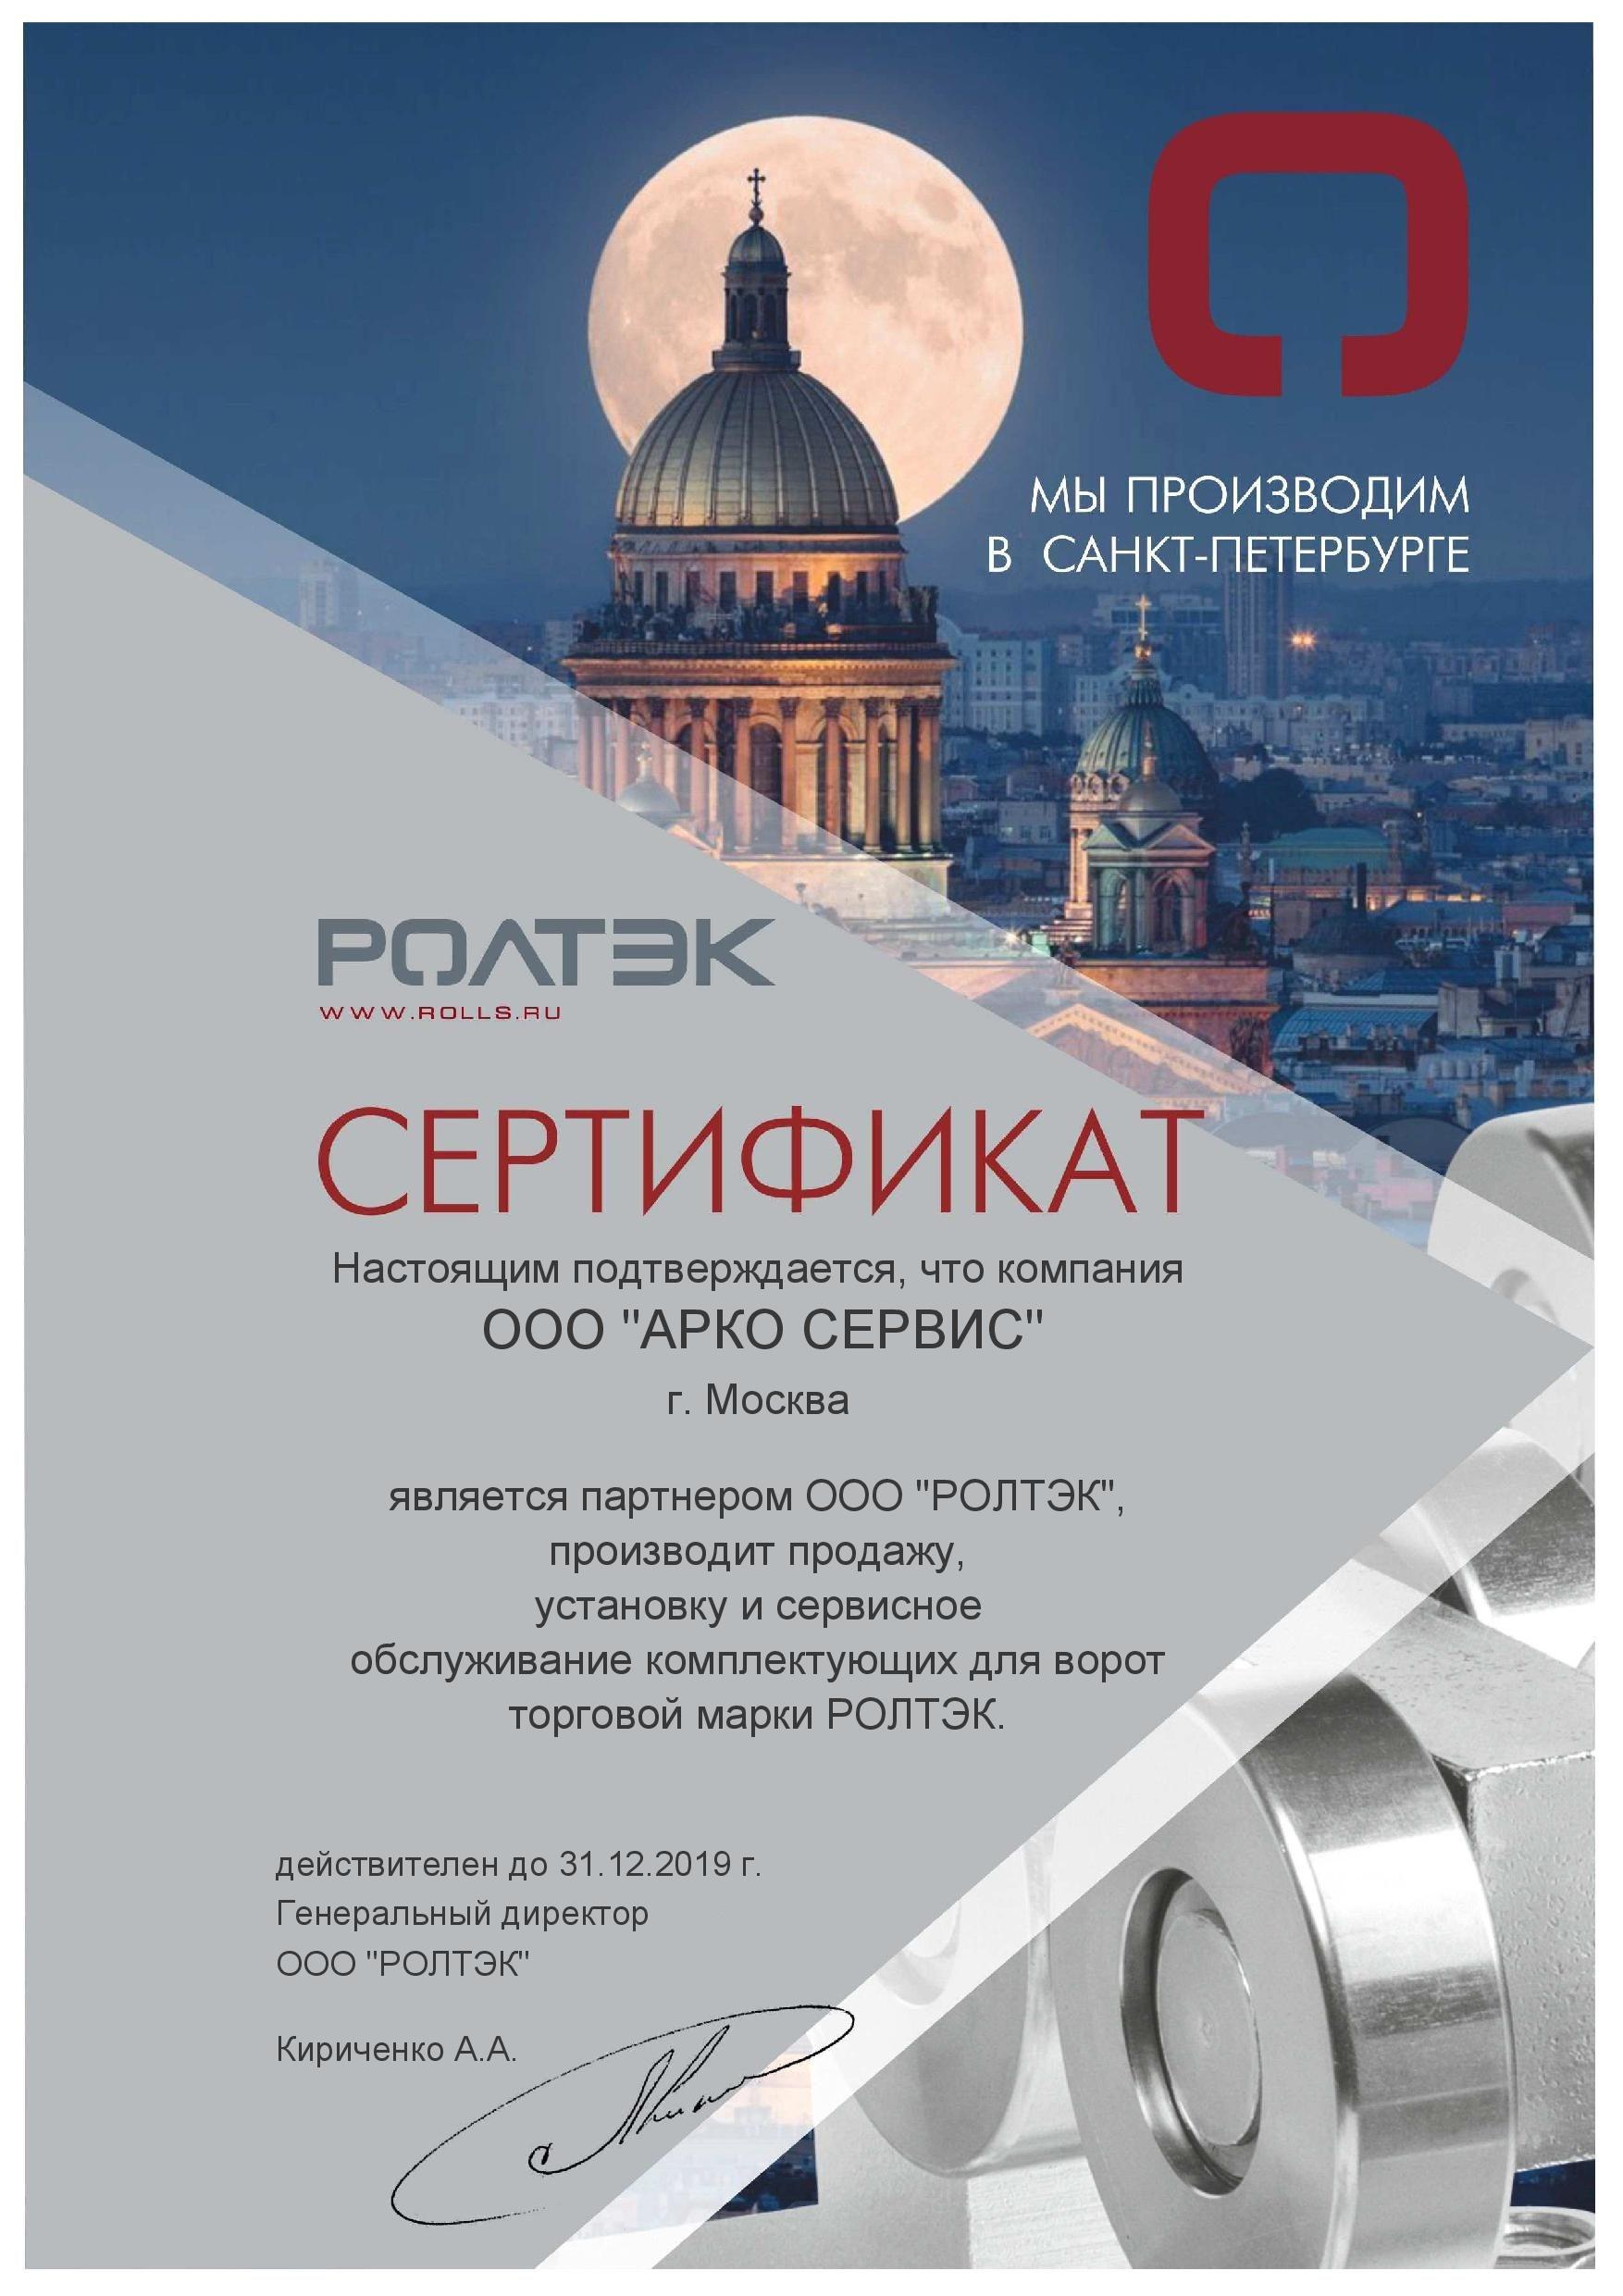 Сертификат РОЛТЭК АРКО СЕРВИС